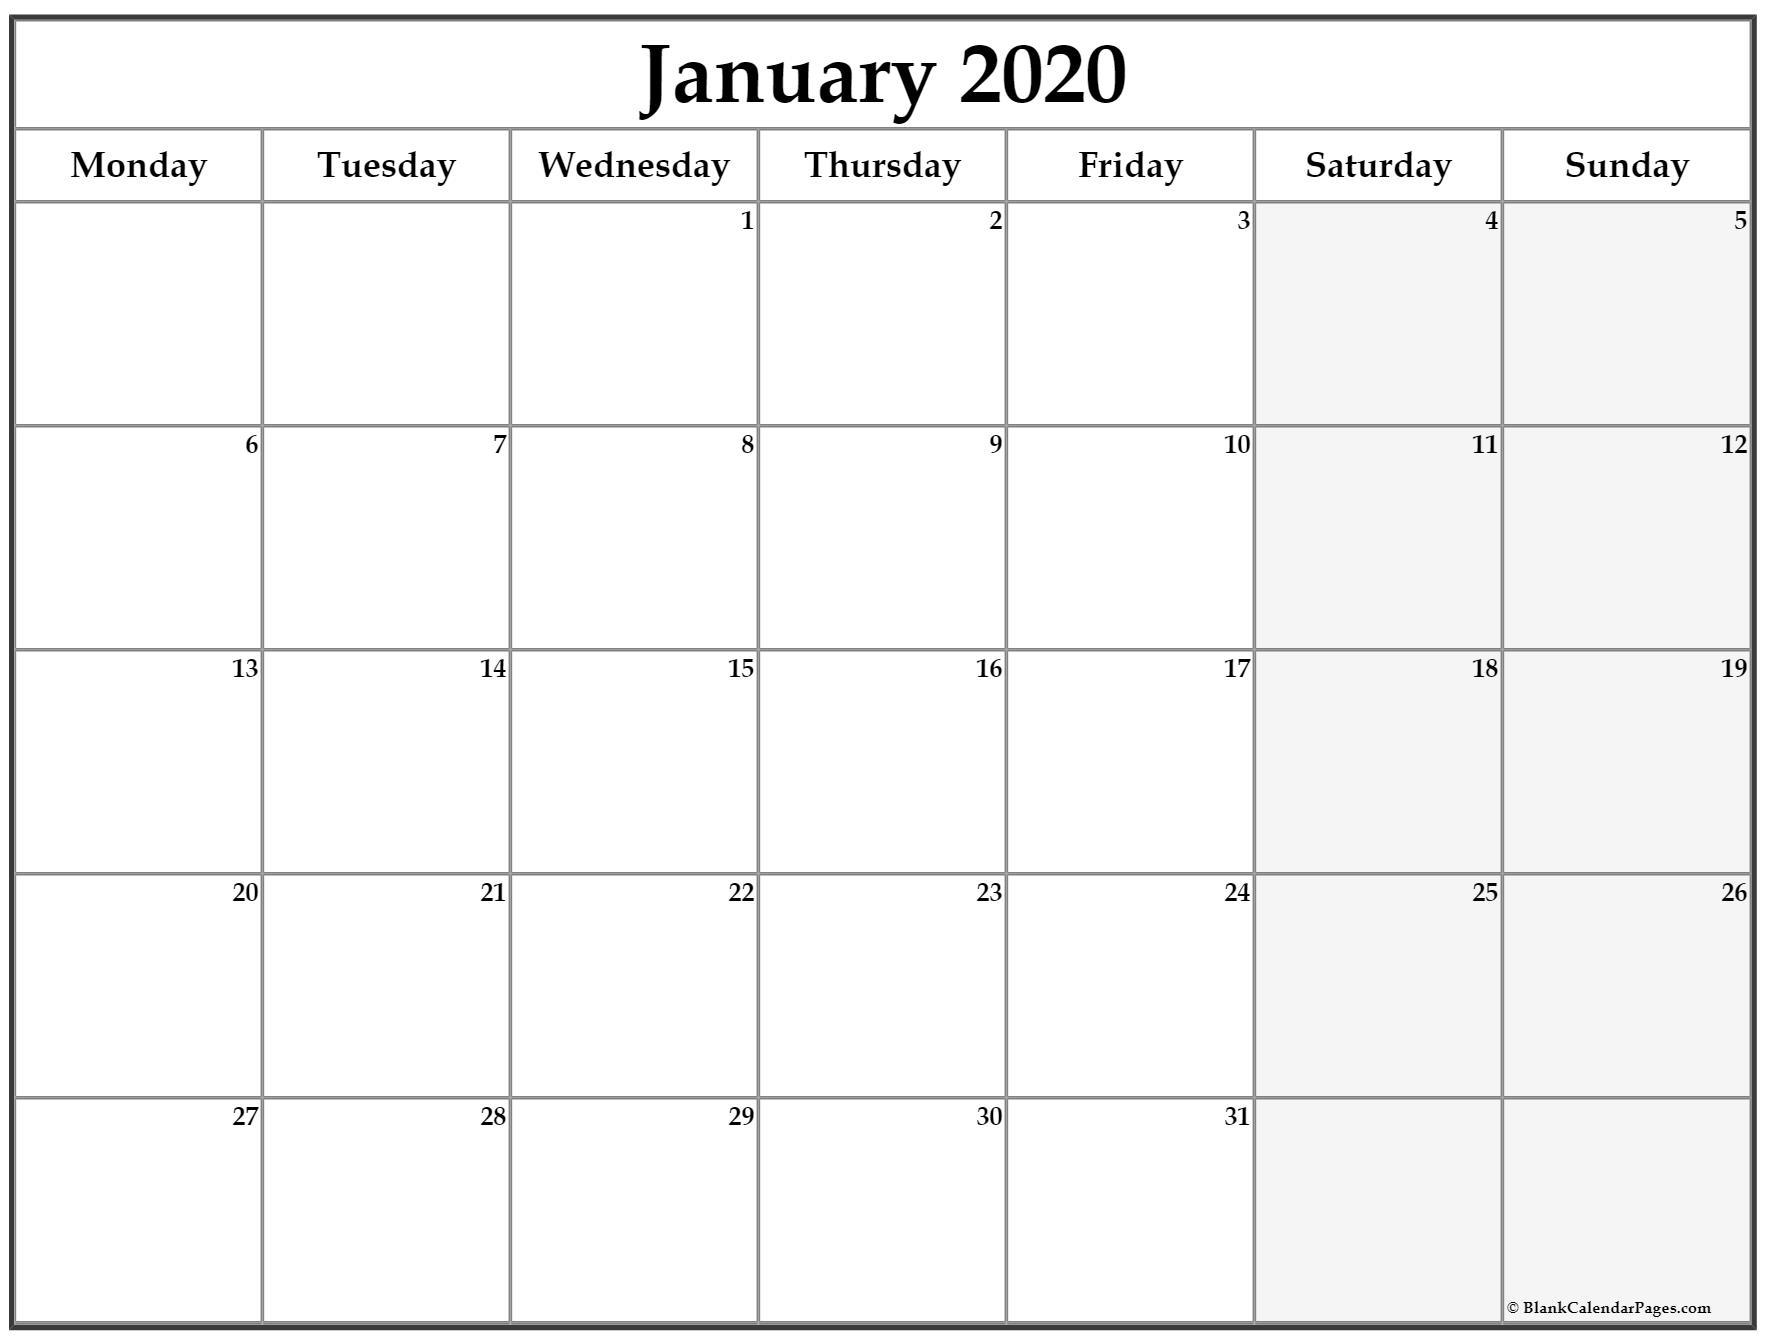 January 2020 Monday Calendar   Monday To Sunday